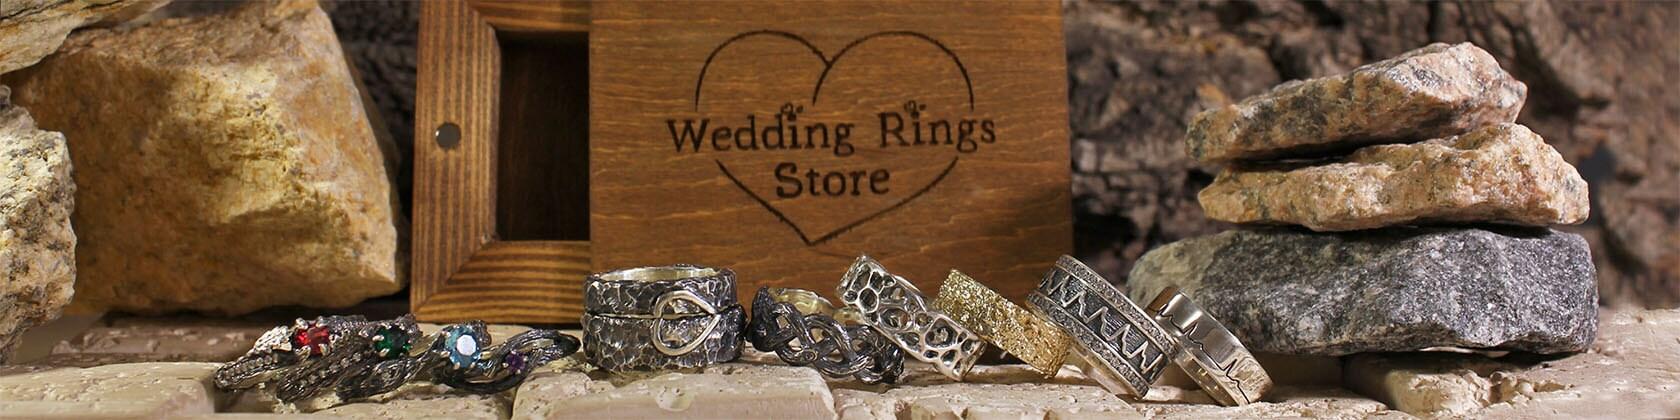 Handmade Unique Wedding Rings By Weddingringsstore On Etsy